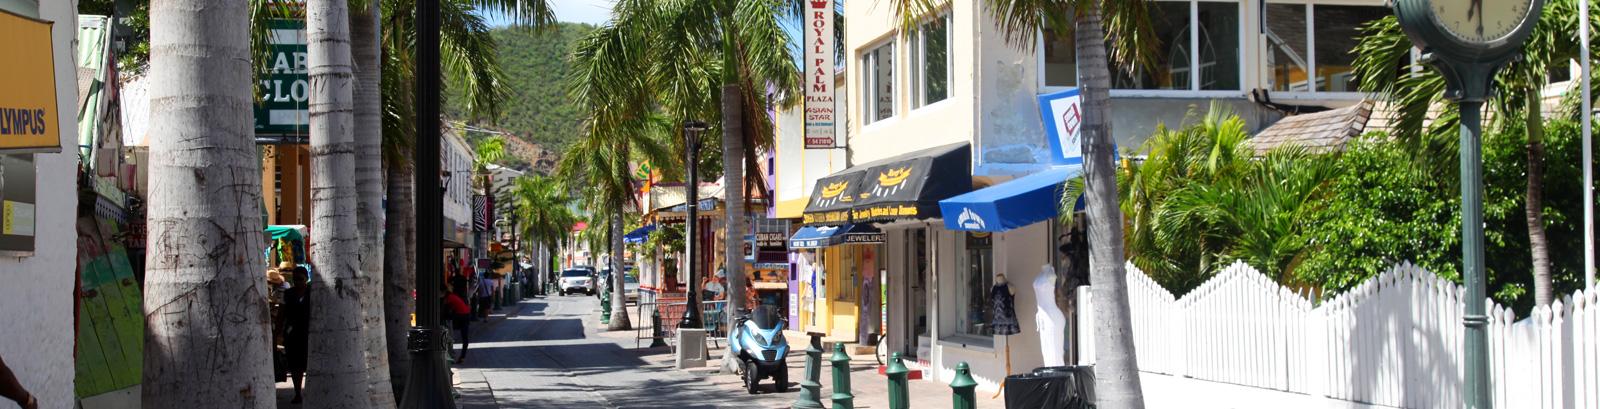 Splash Jewelers - Nos recommandations au Simpson Bay Resort